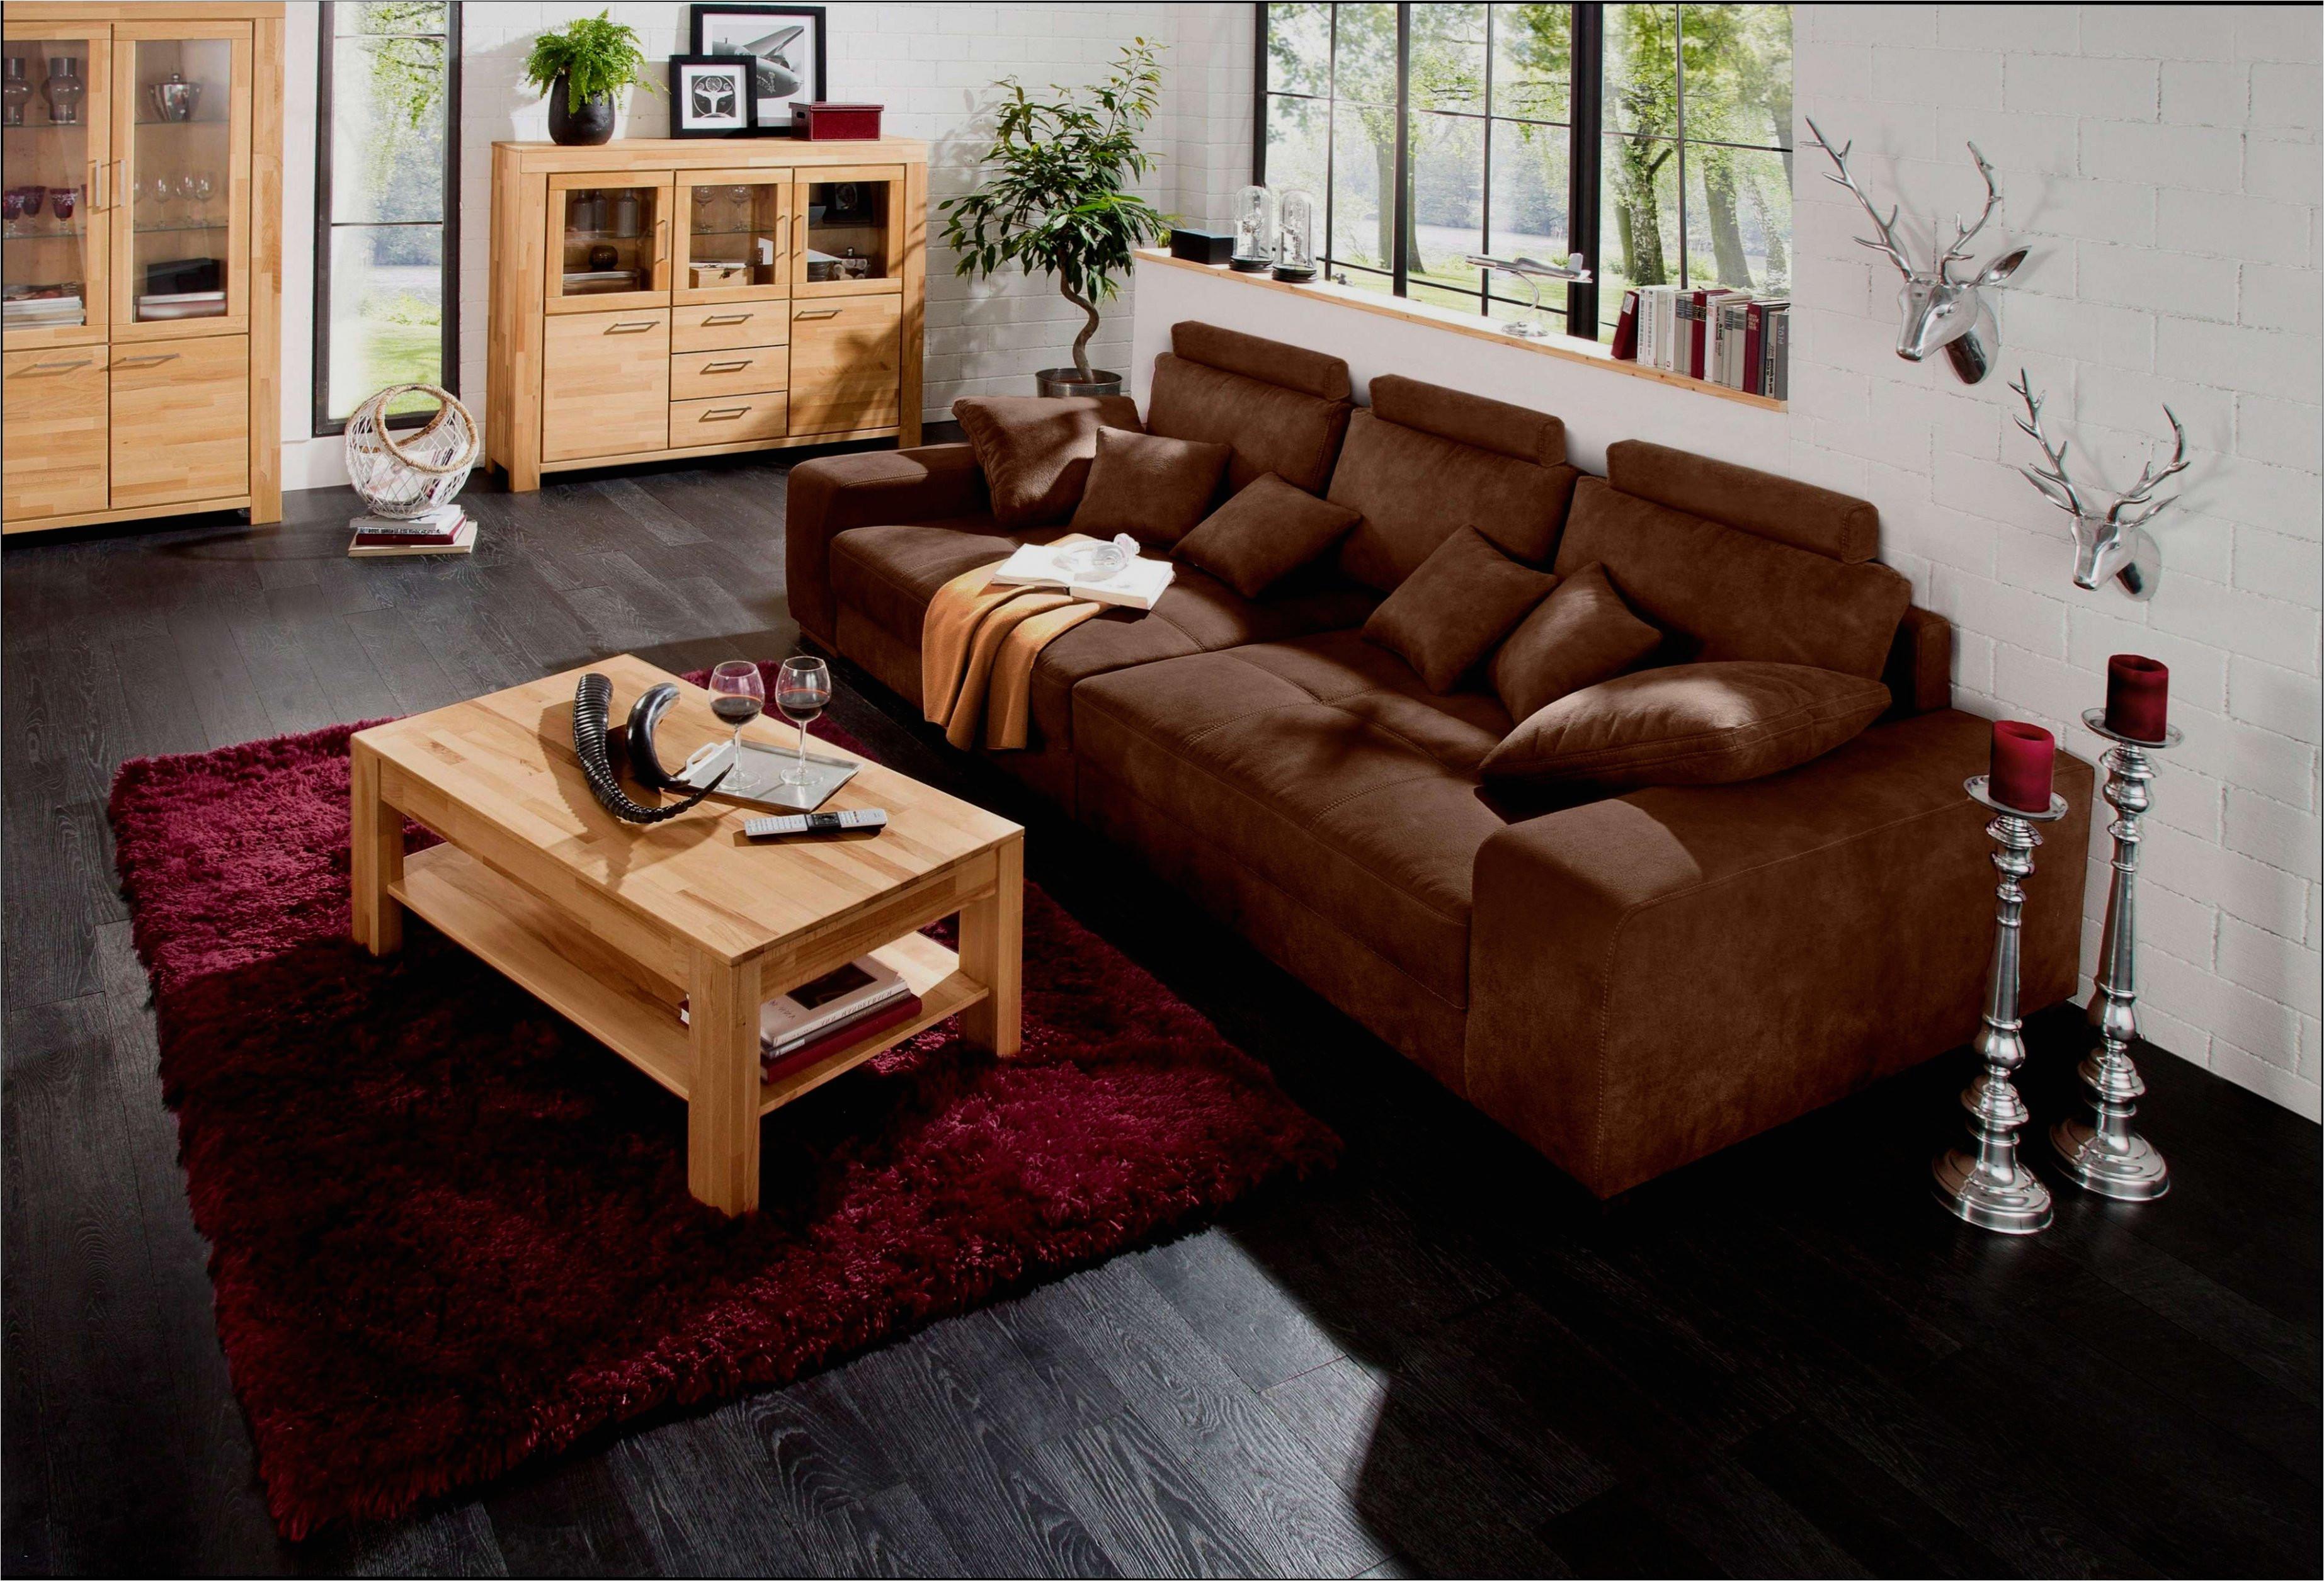 graues ledersofa best graues ledersofa sofa schon sofa design best graue couch 0d archives sofa